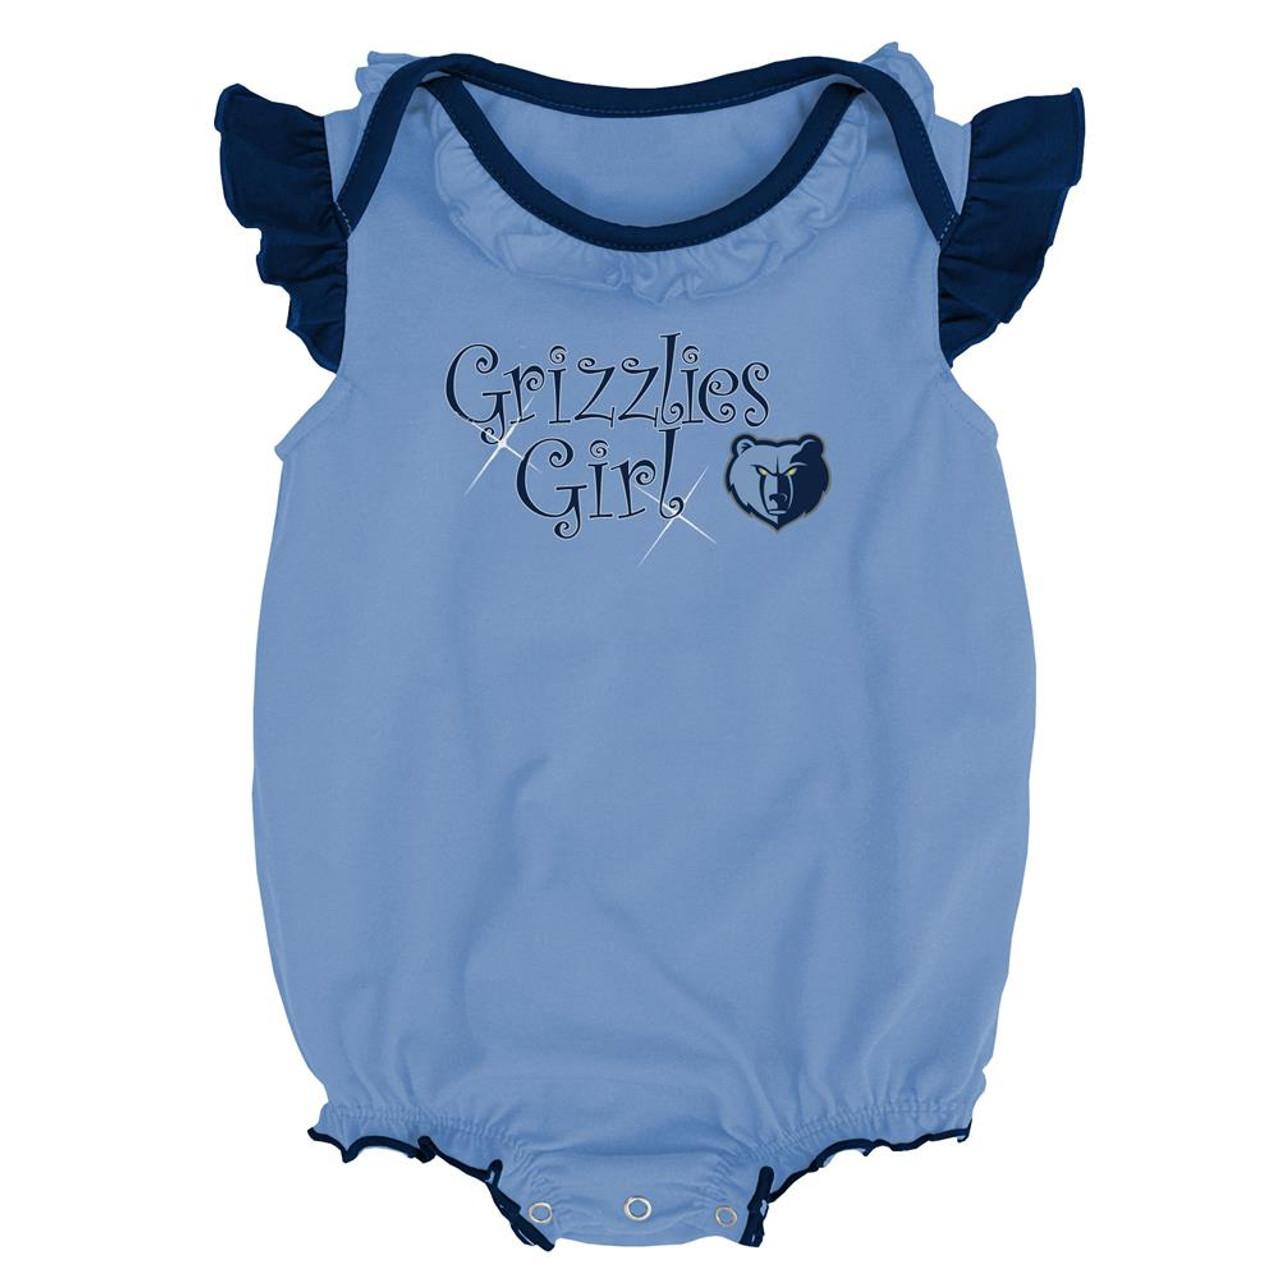 Memphis Grizzlies Creeper 2 Pack Homecoming Bodysuit Set